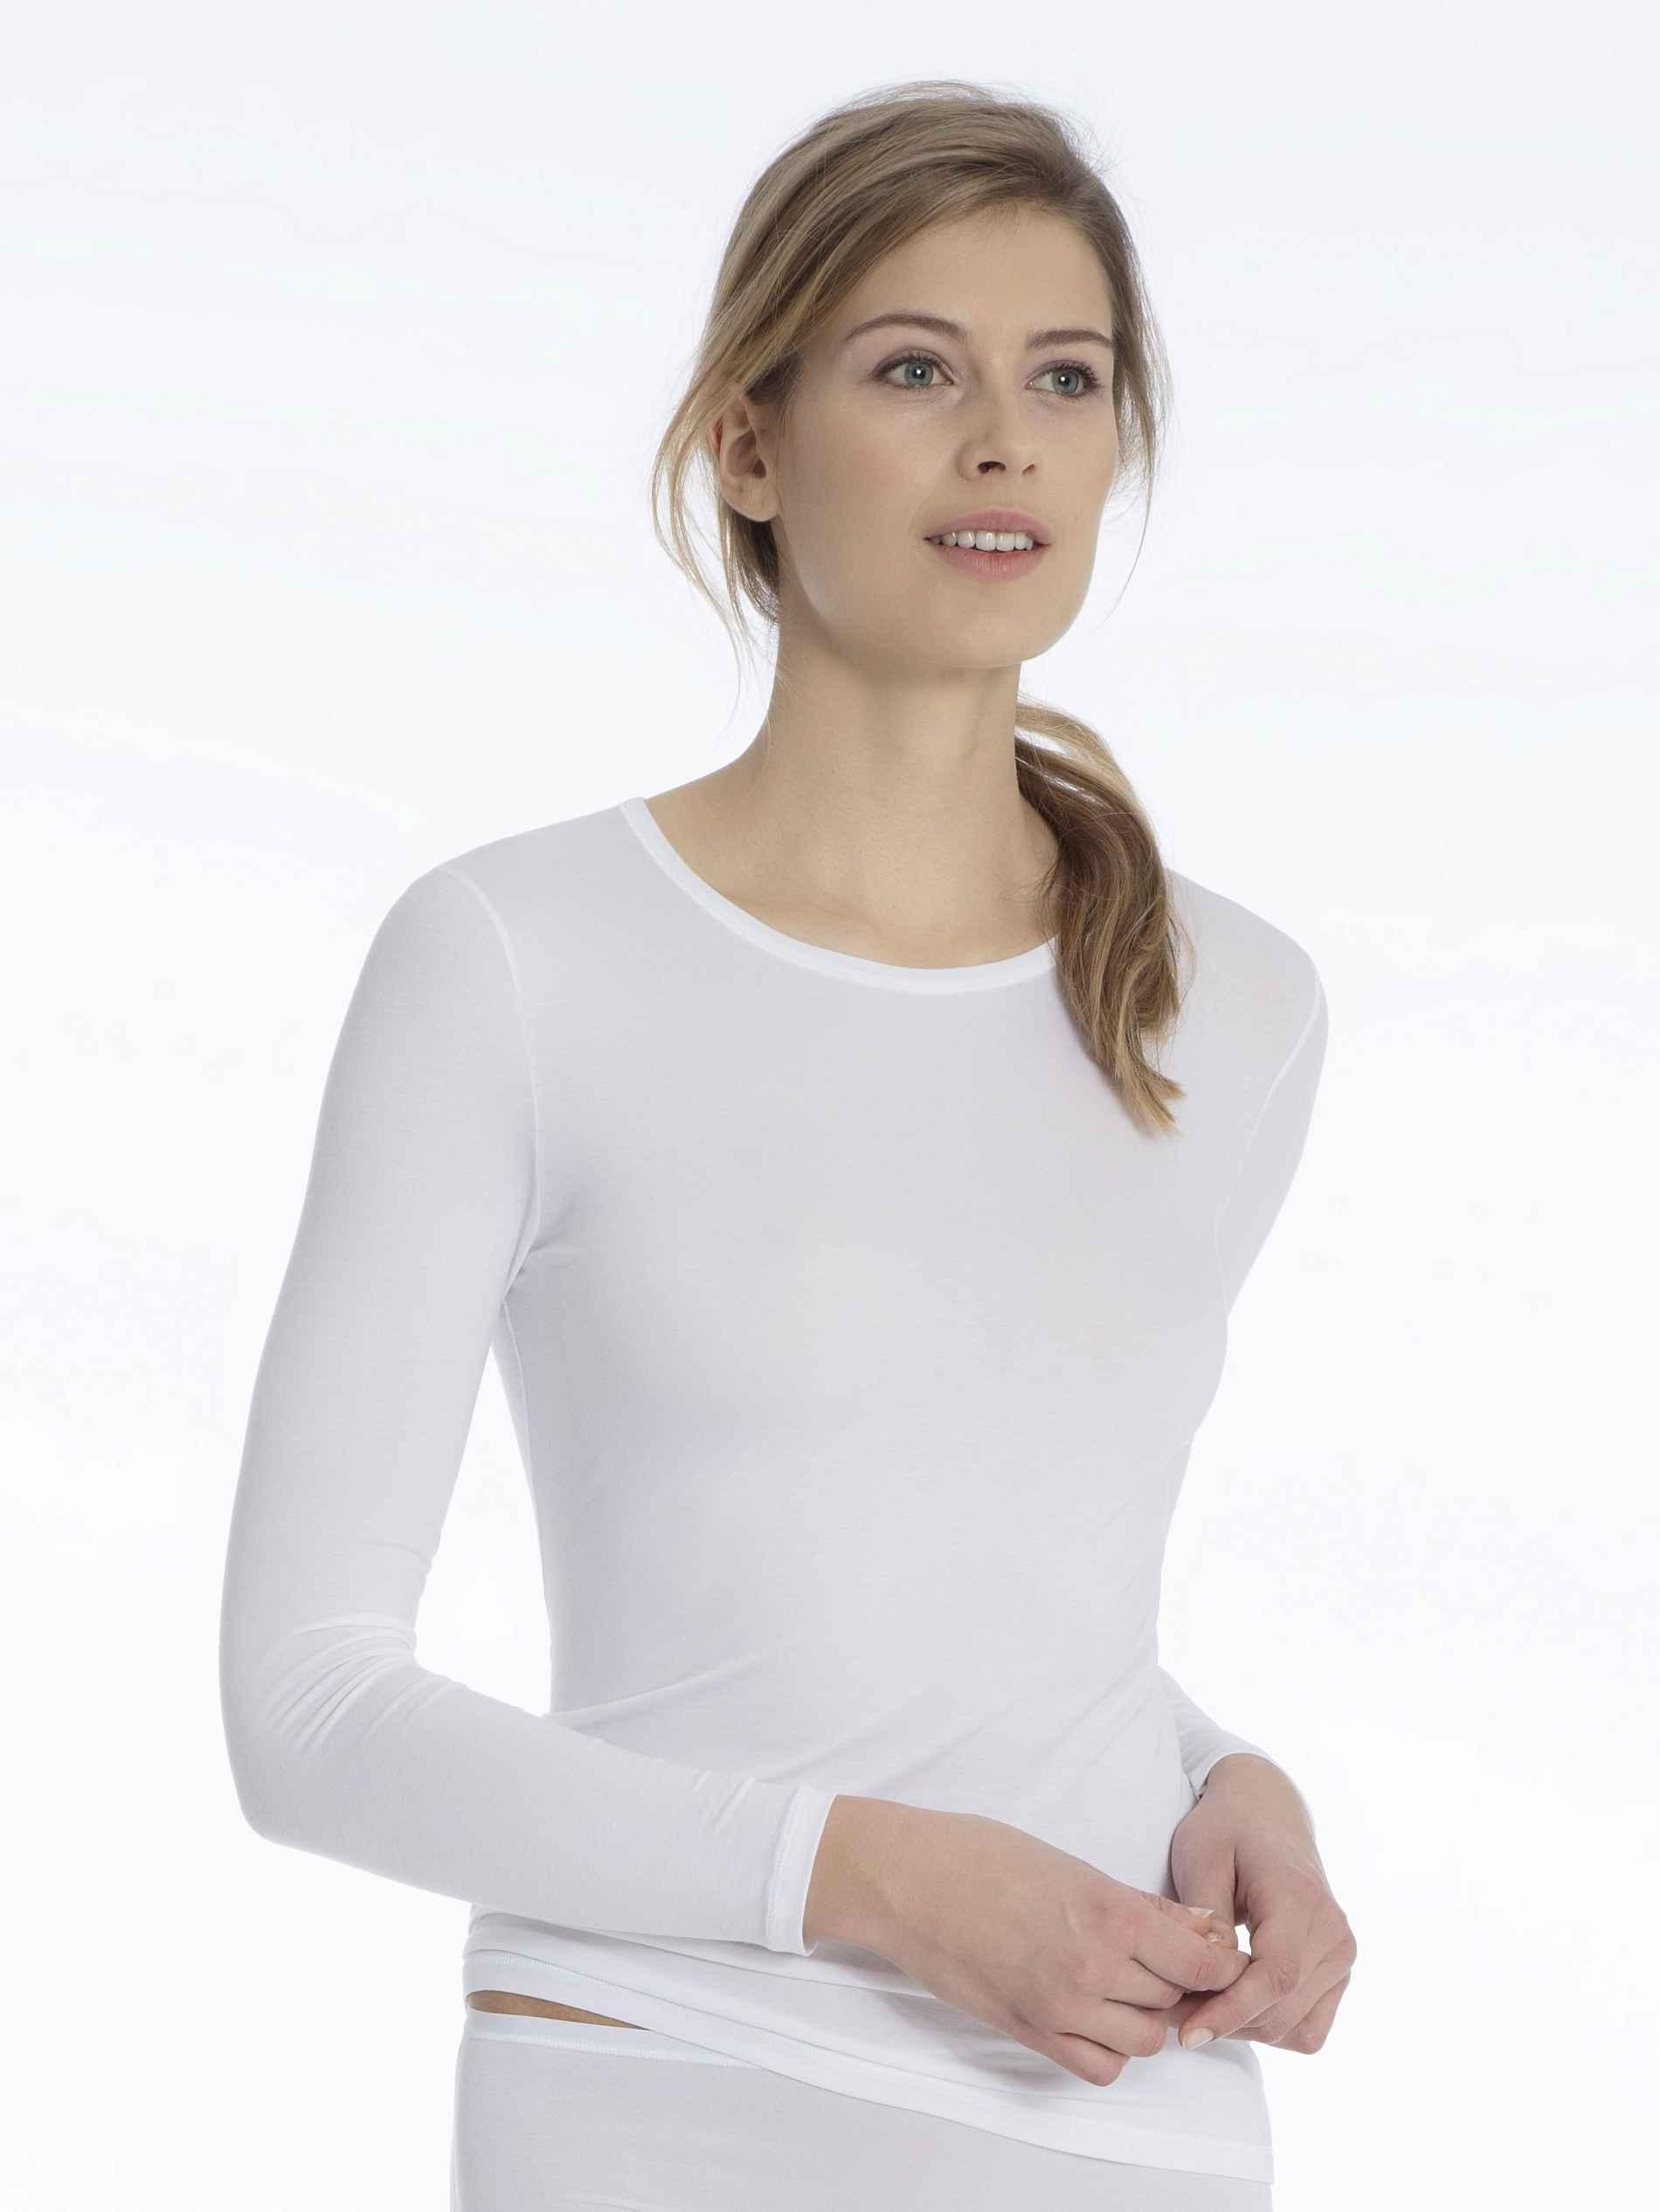 Damen CALIDA Balance Funktions-Langarm Shirt weiß | 7613306400110, 7613306400127, 7613306400134, 7613306400141, 7613306400158, 7613306400165, 7613306400172, 7613306400189